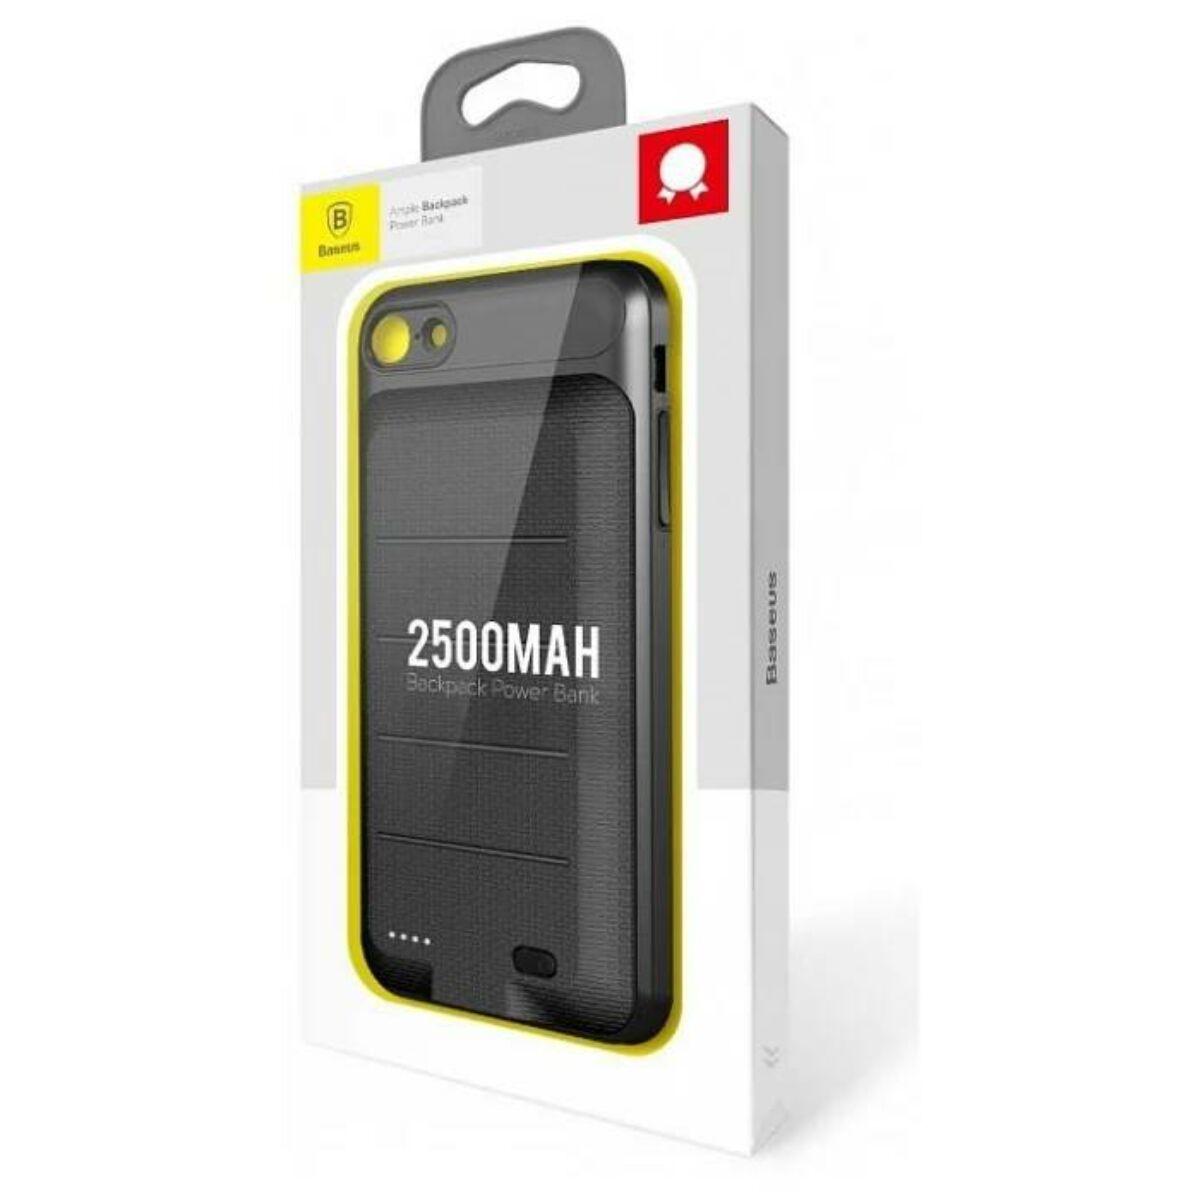 Baseus Power Bank tok, Ample Backpack 2500 mAh iPhone 6/6s, fekete (ACAPIPH6S-XB01)